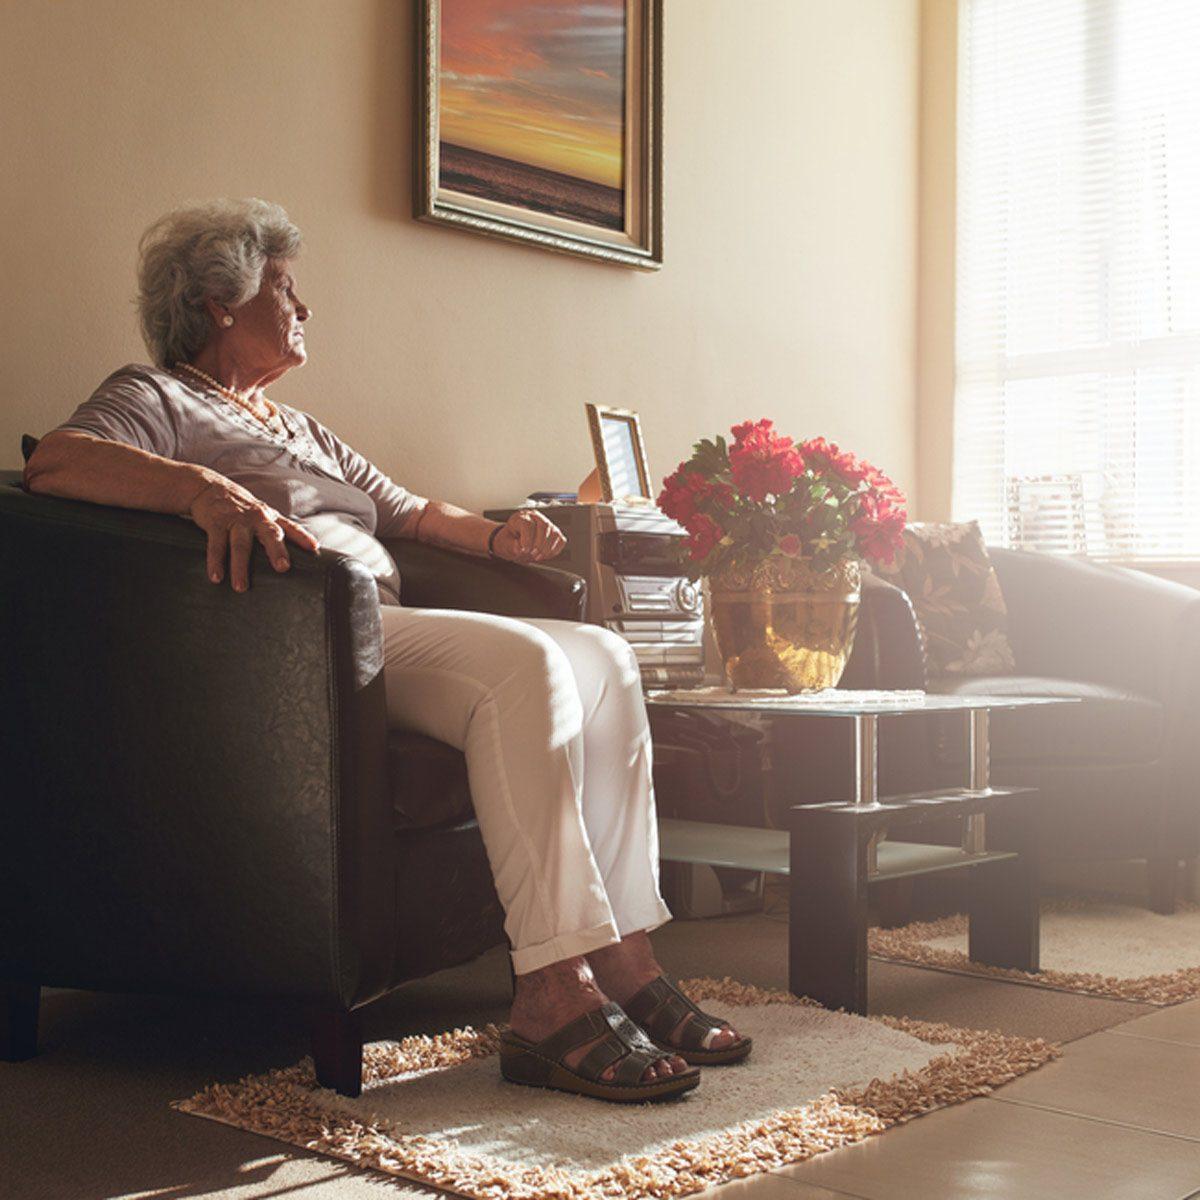 shutterstock_457918912 old woman grandma